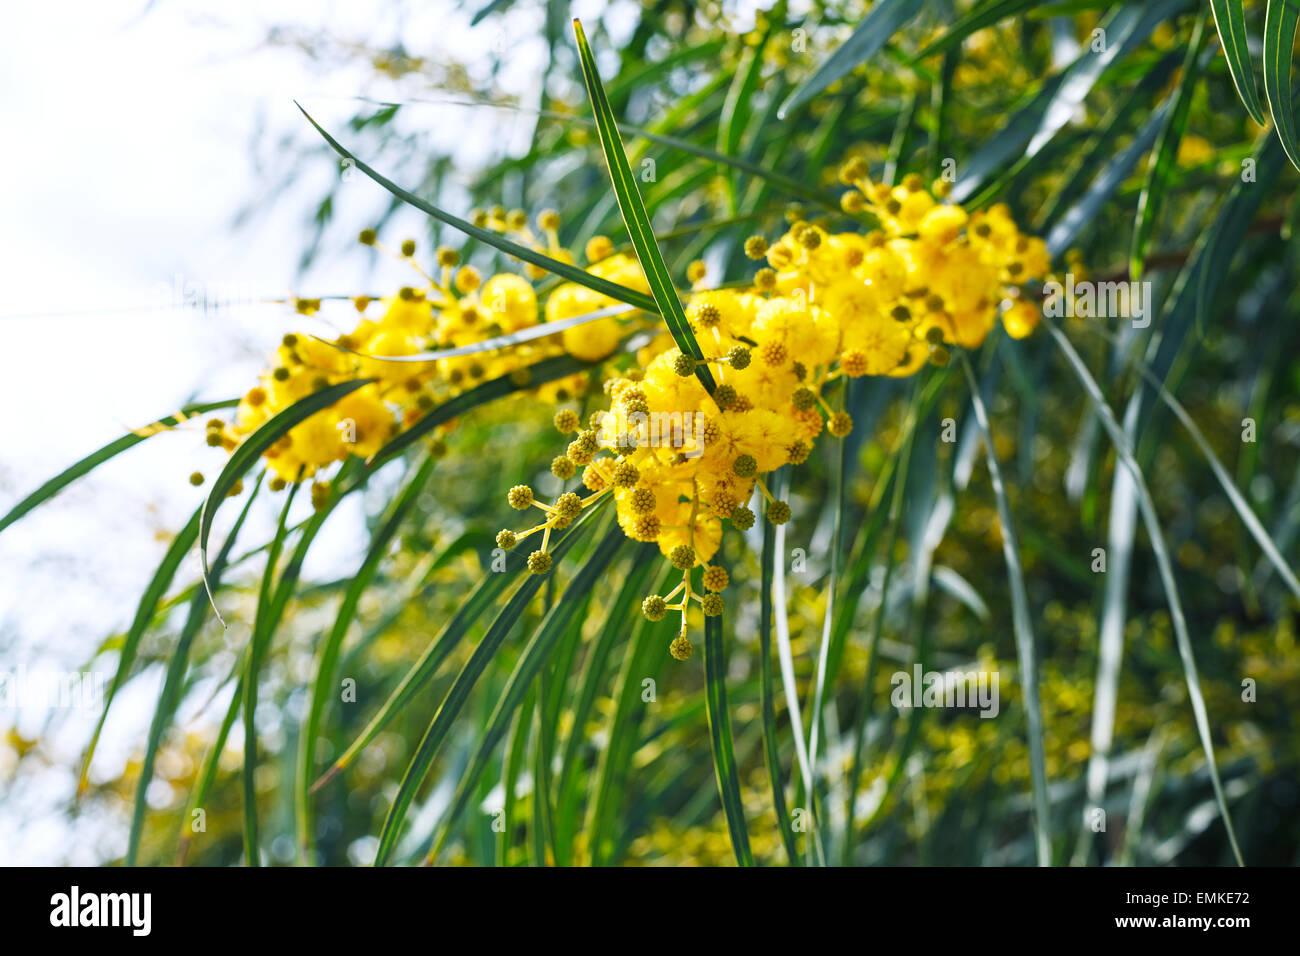 gelbe bl ten der mimose baum acacia pycnantha golden. Black Bedroom Furniture Sets. Home Design Ideas